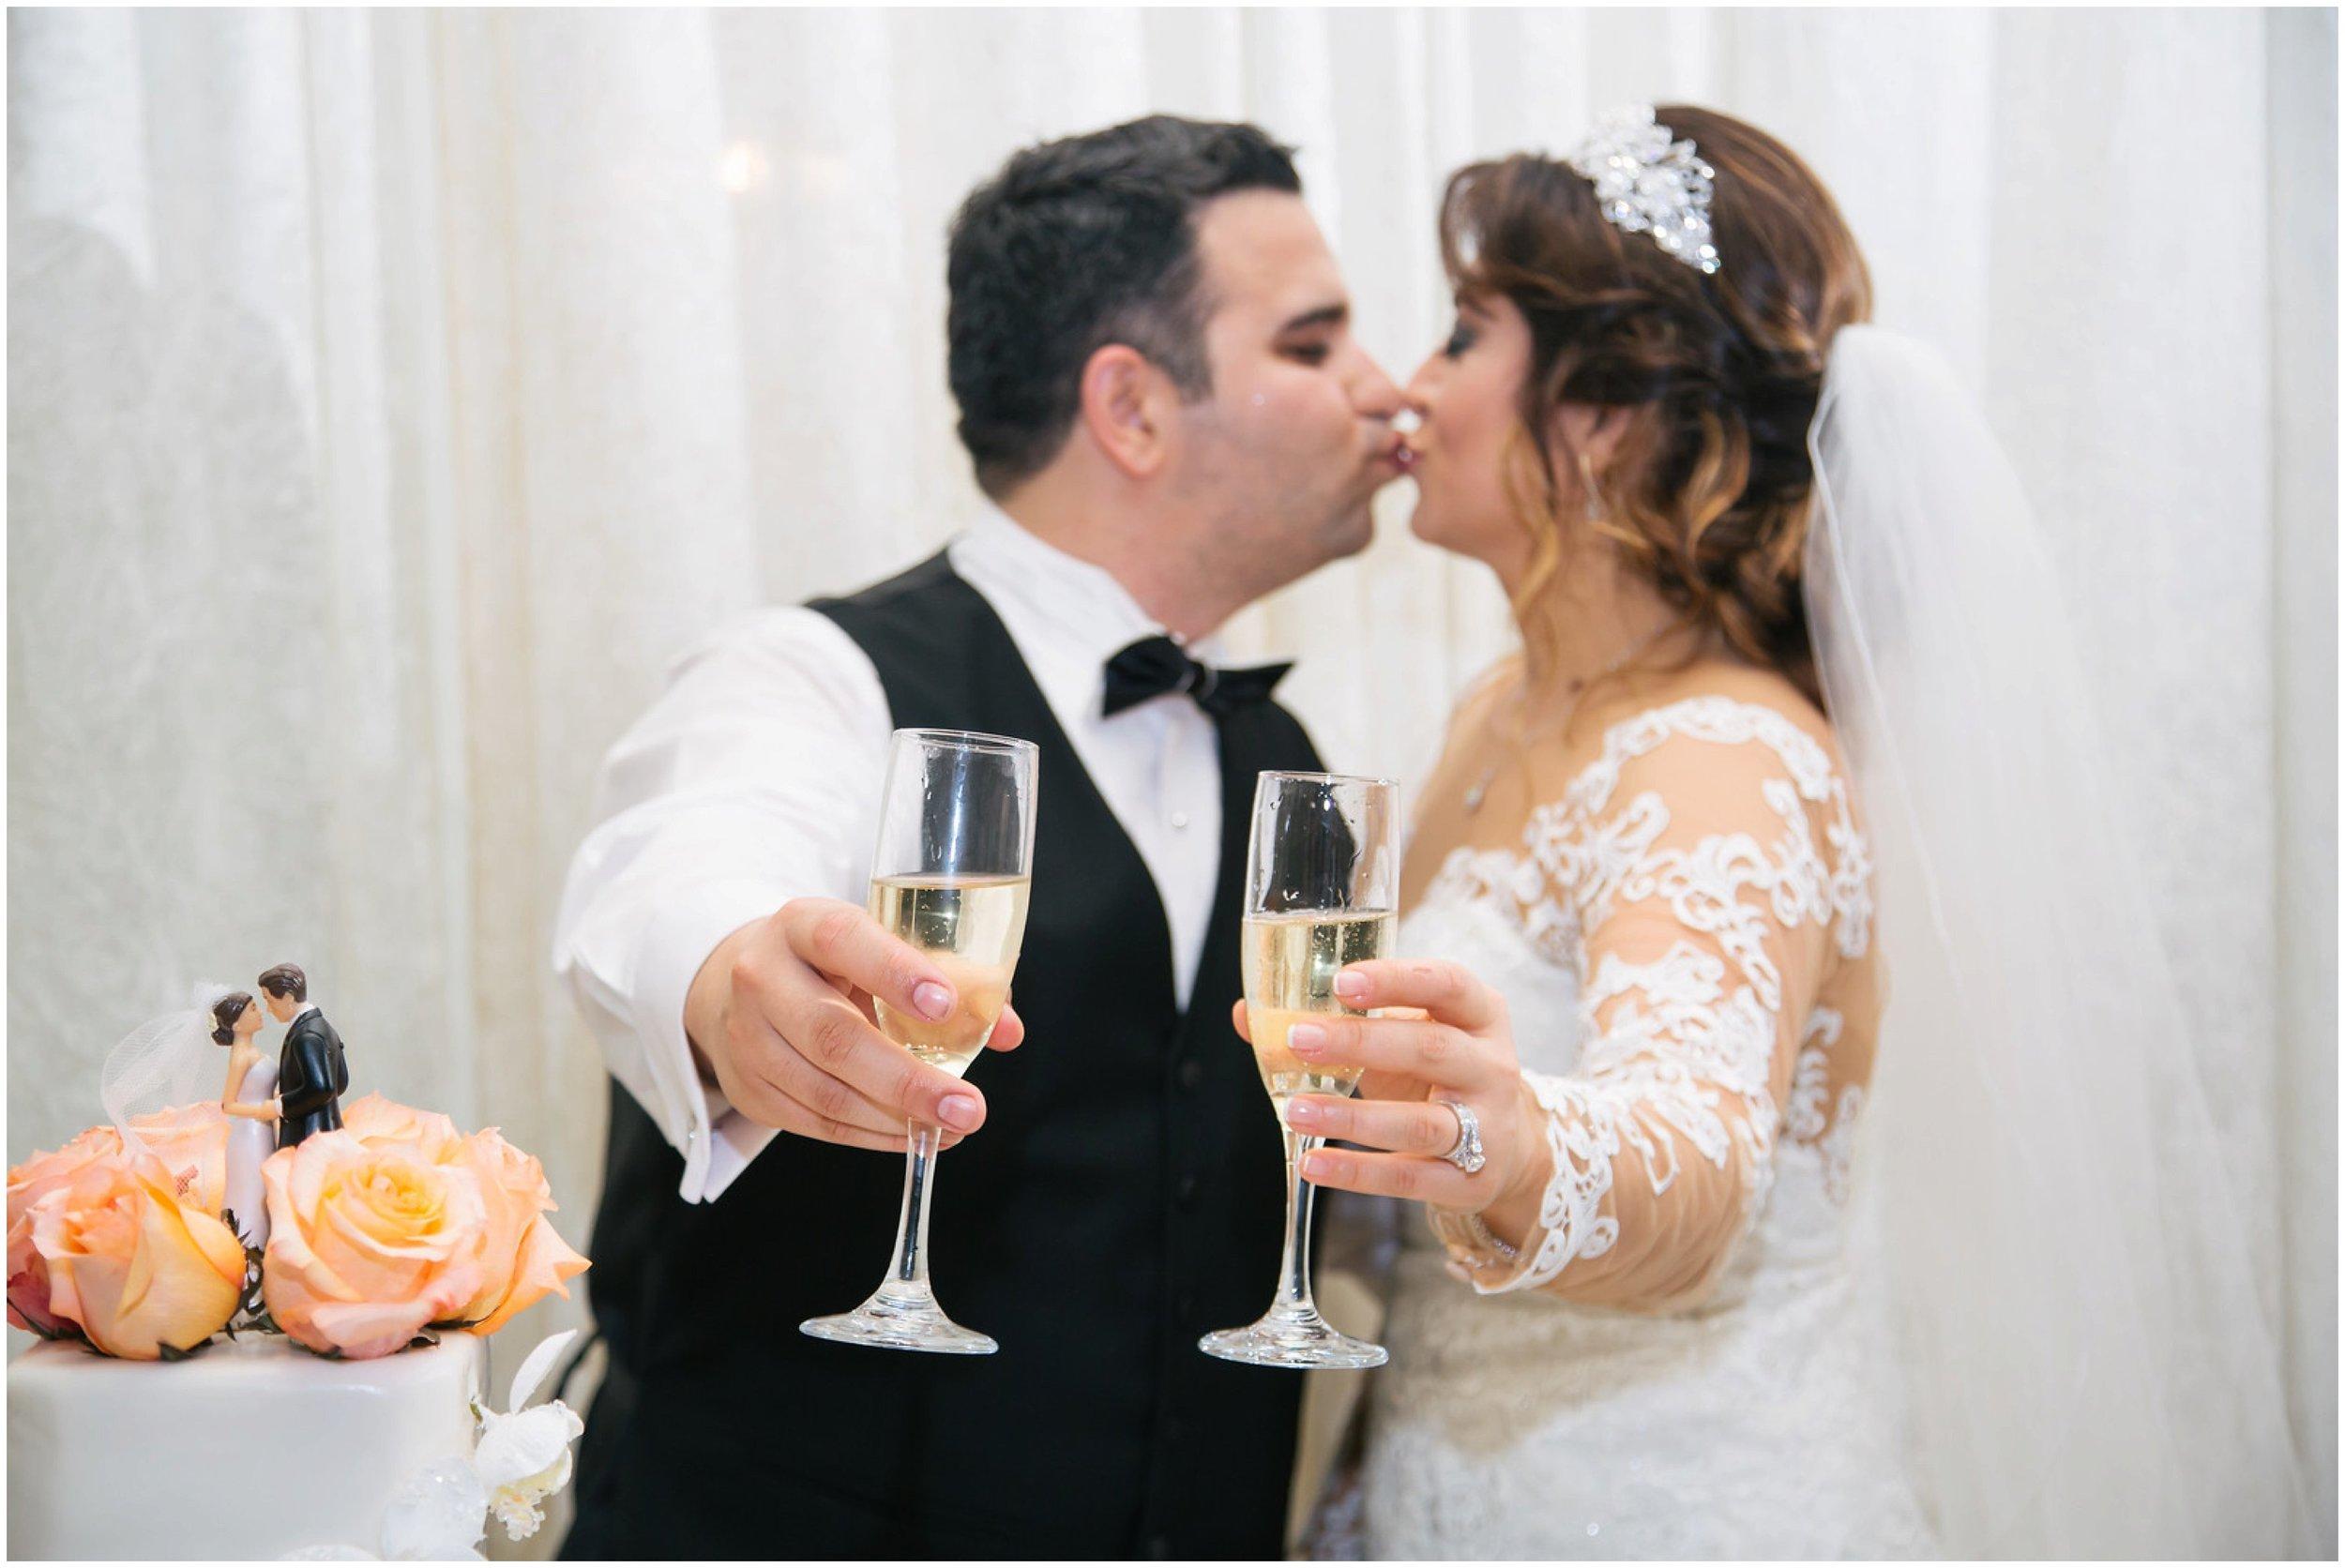 Le Cape Weddings- Destination Wedding Photography -ShayanandNikkie-744-X3_LuxuryDestinationPhotographer.jpg